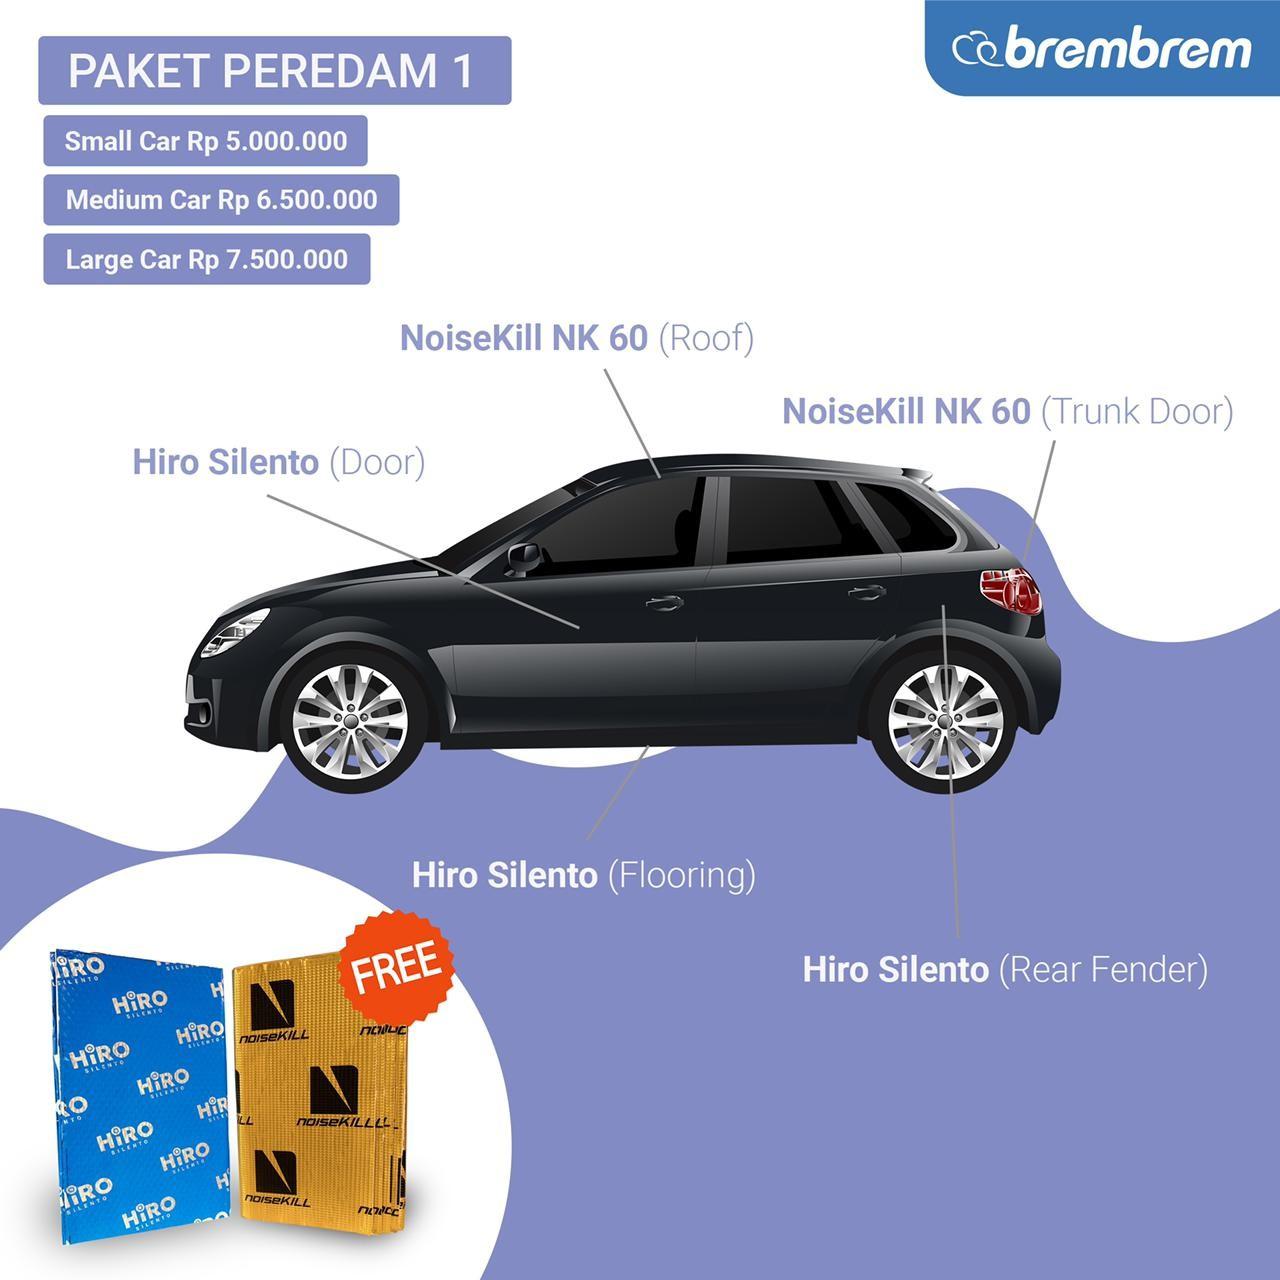 PAKET PEREDAM 1 - PROMO MENANG BANYAK - SMALL CAR